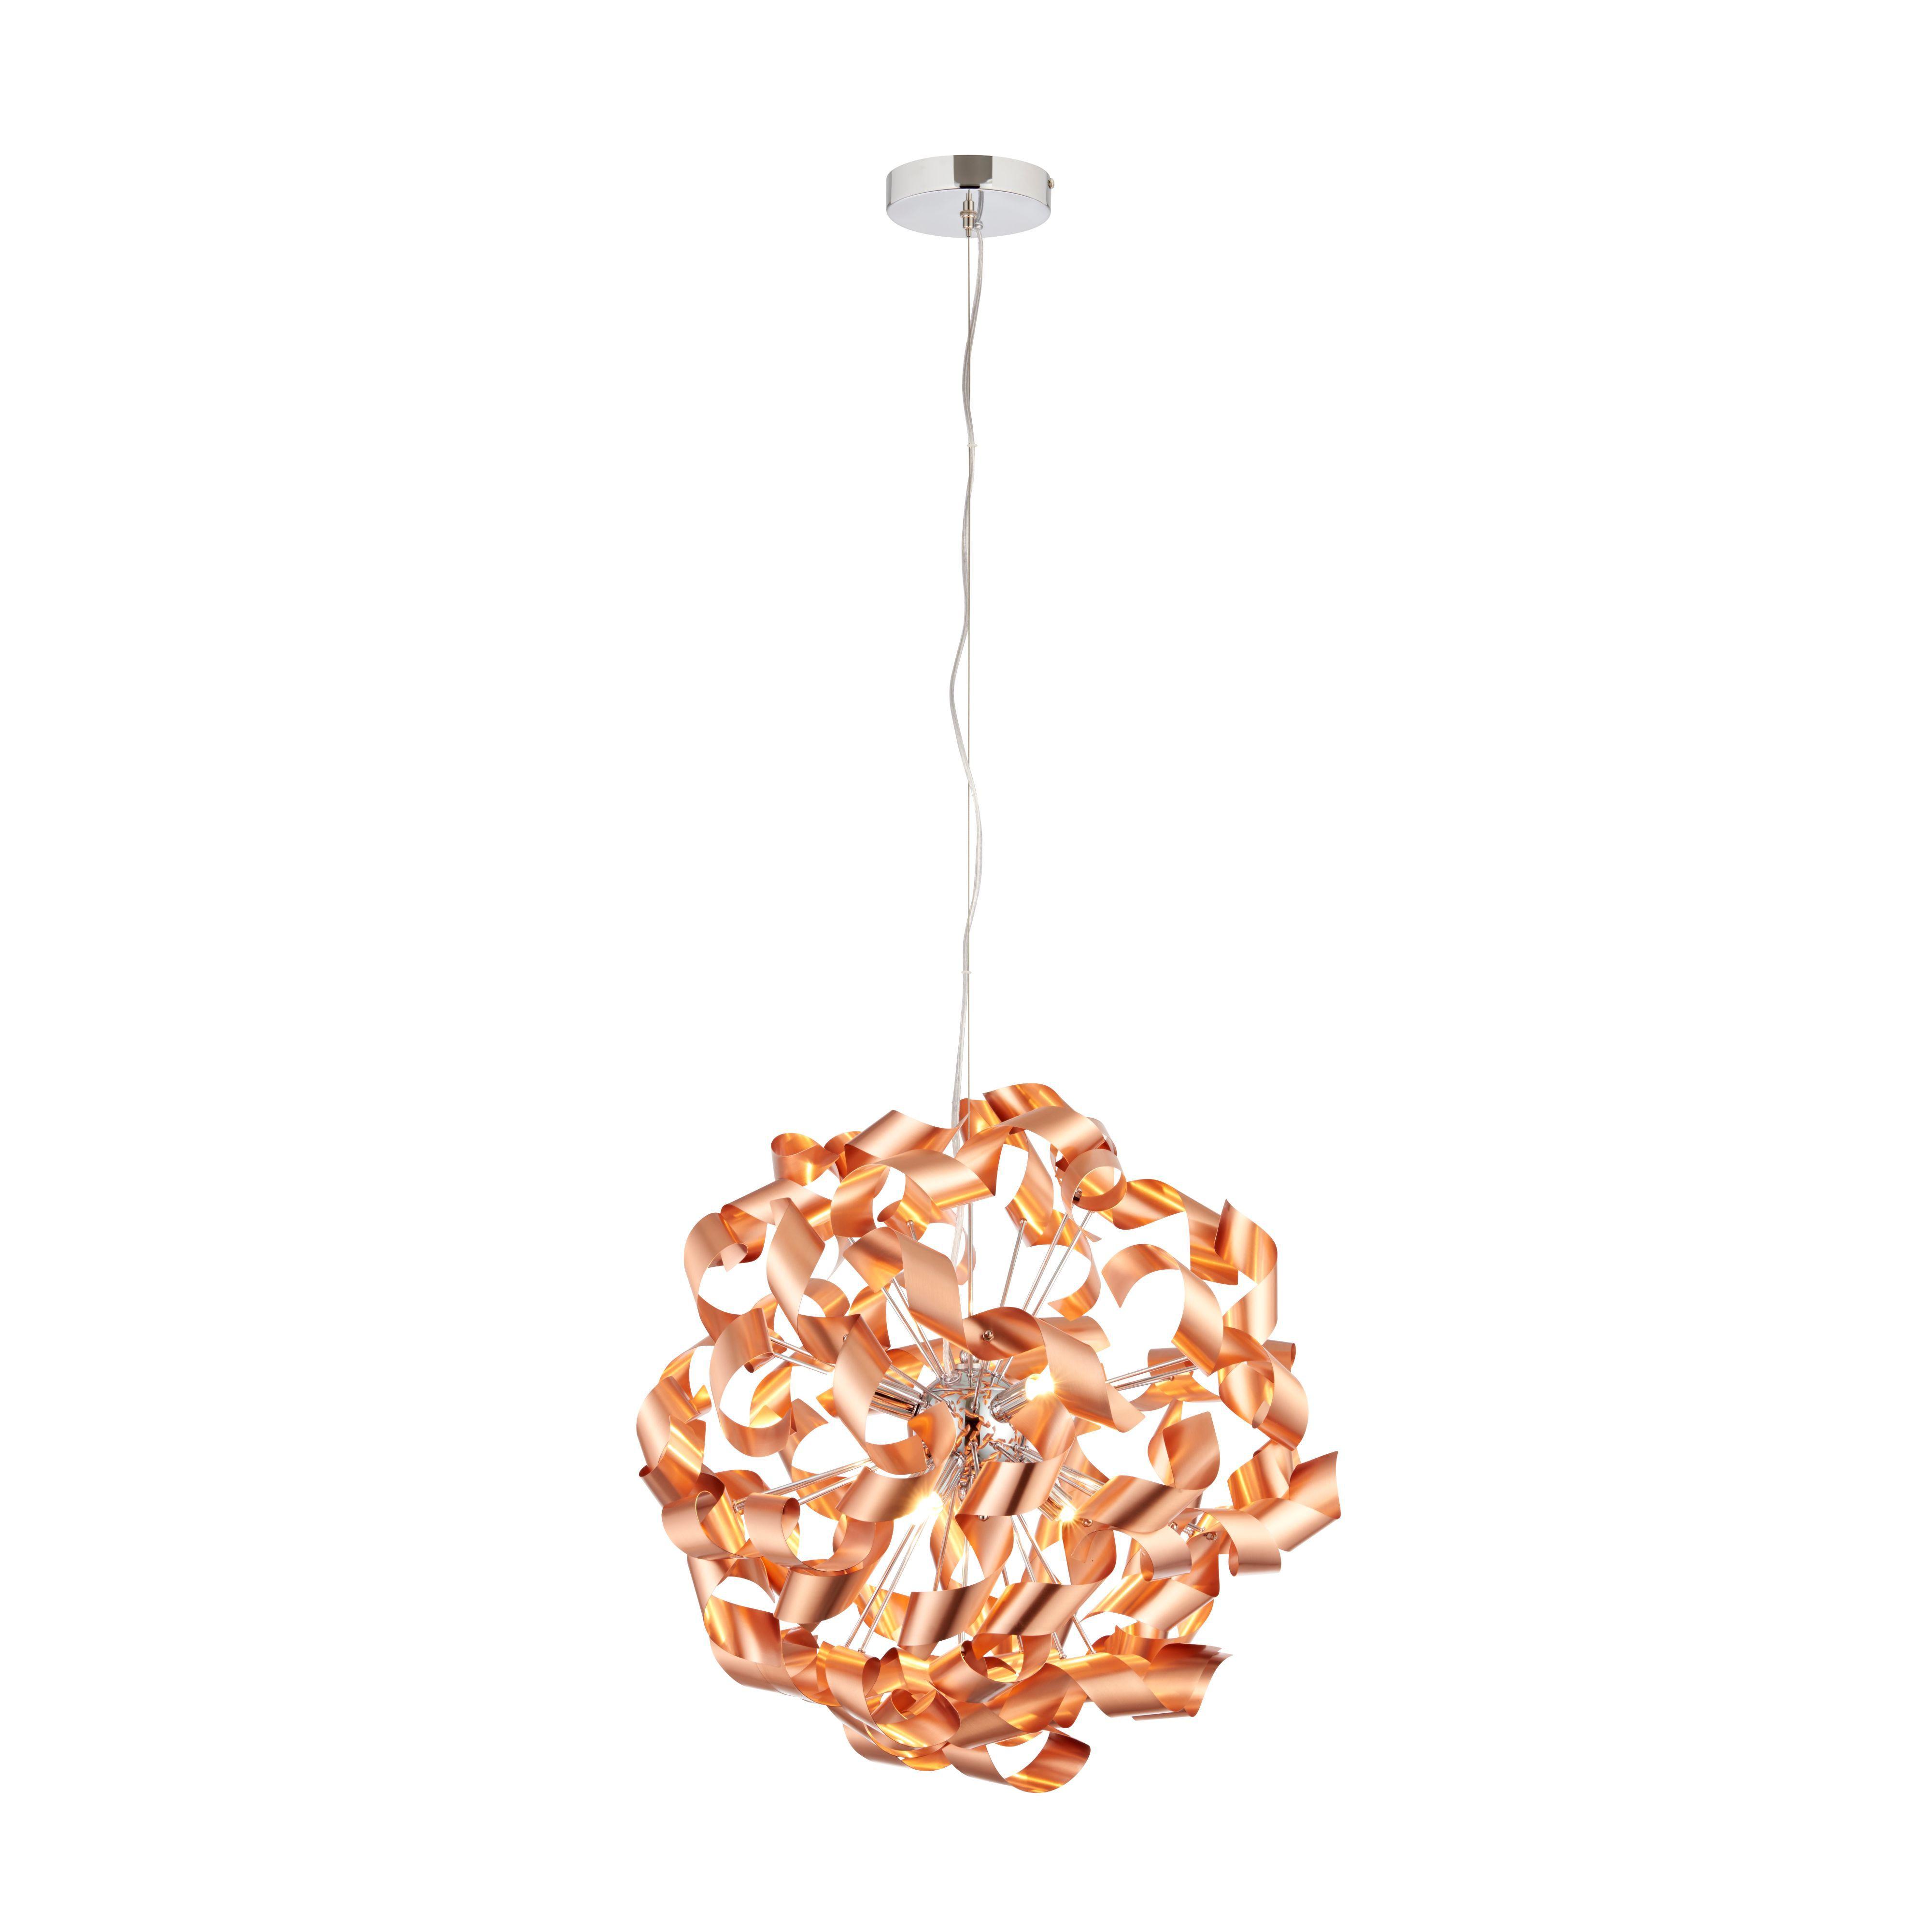 Diy at bq focal point light fixture marcela modern copper brushed 6 lamp ceiling light arubaitofo Images